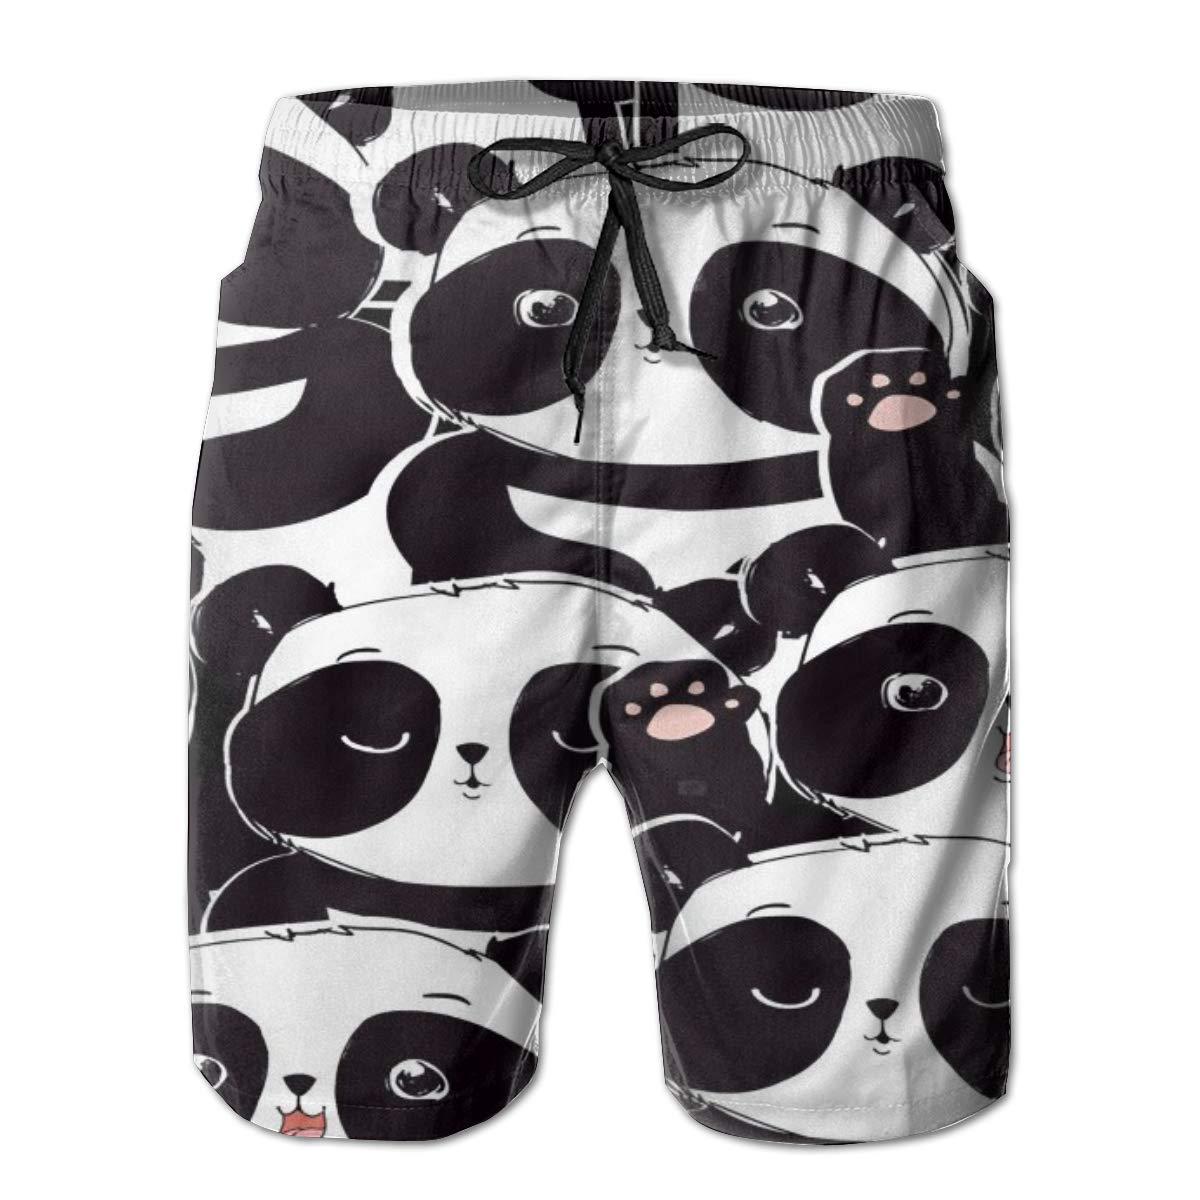 Airealy Men/'s Summer Beach Trunks Cartoon Lovely Panda Bear Drawstring Elastic Waist Quick Drying Surfing Beach Board Shorts